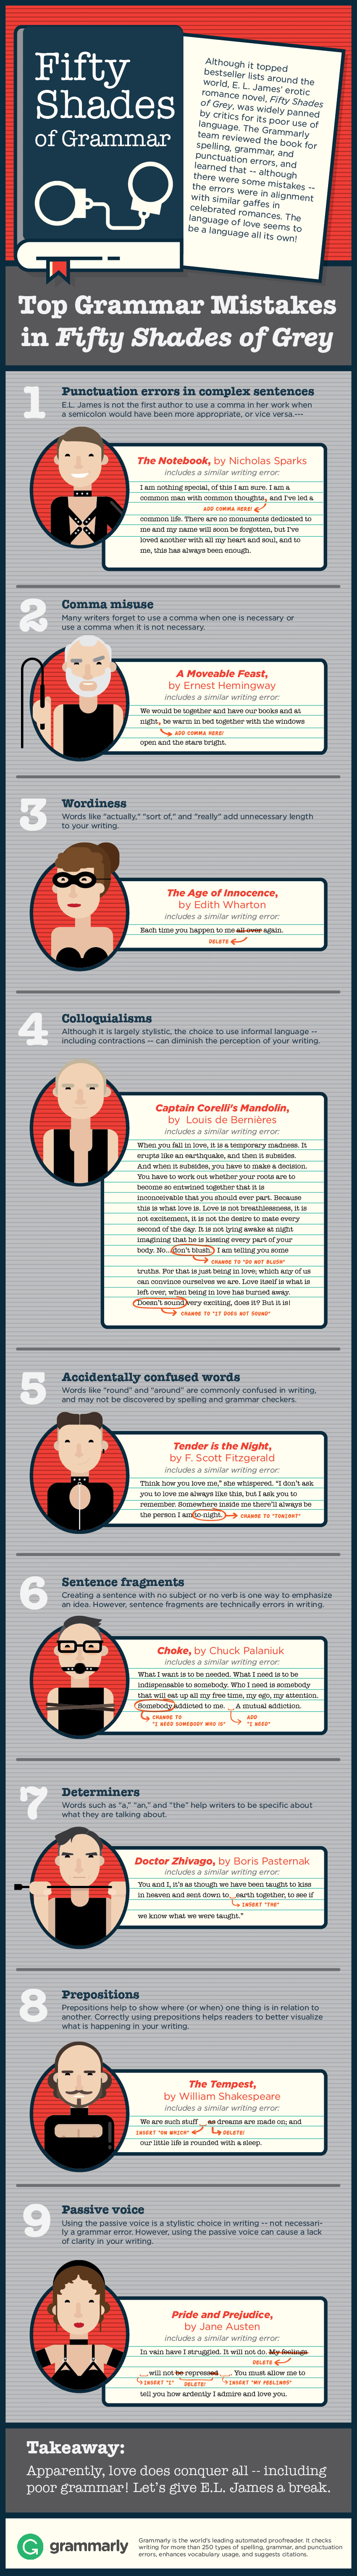 Grammarly: Fifty Shades of Grammar